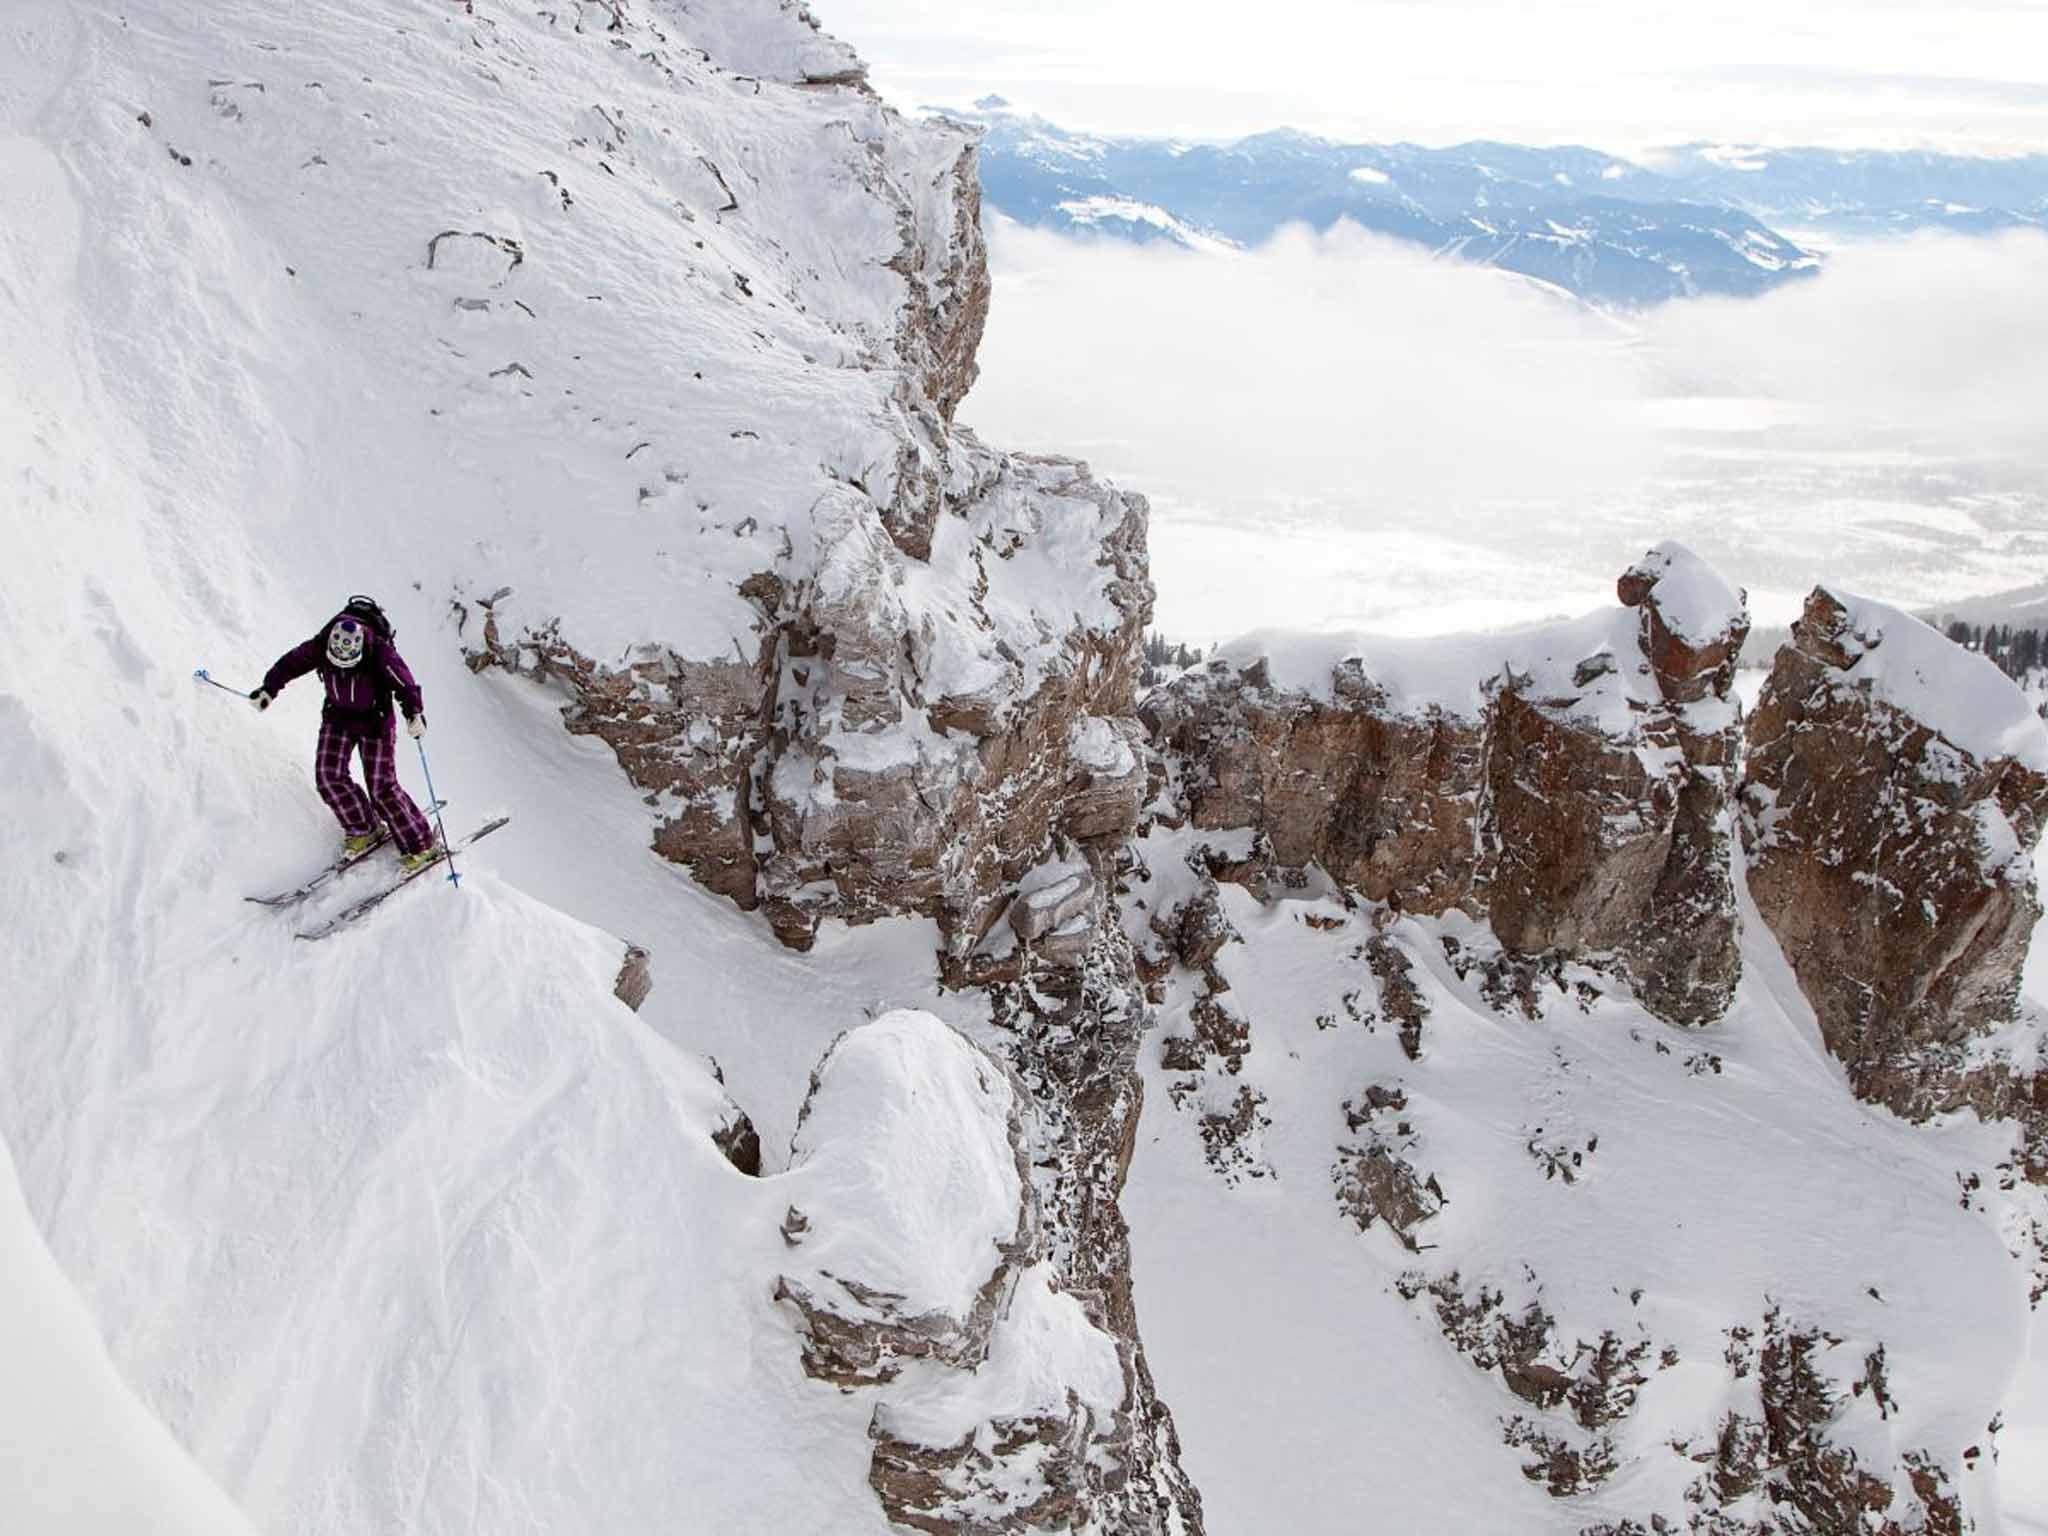 jackson hole skiing: the wild wyoming resort was established 50